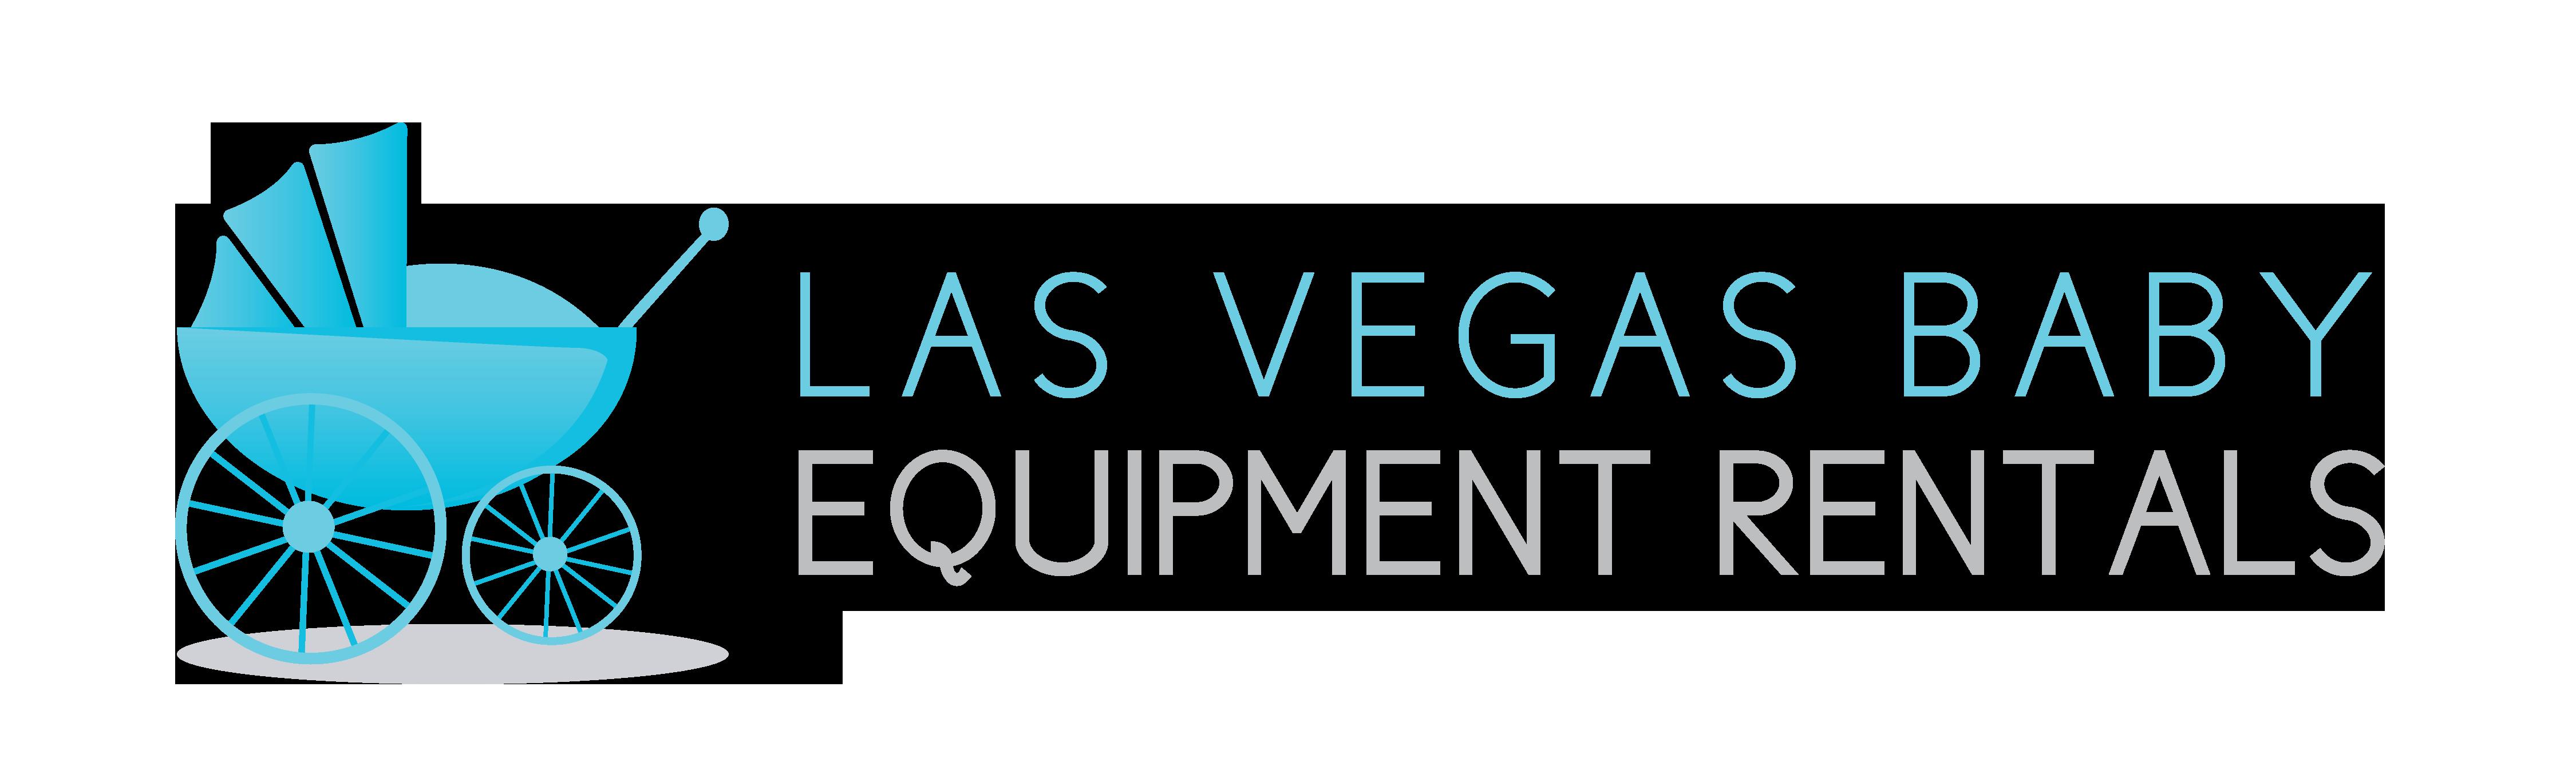 Las Vegas Baby Equipment Rentals